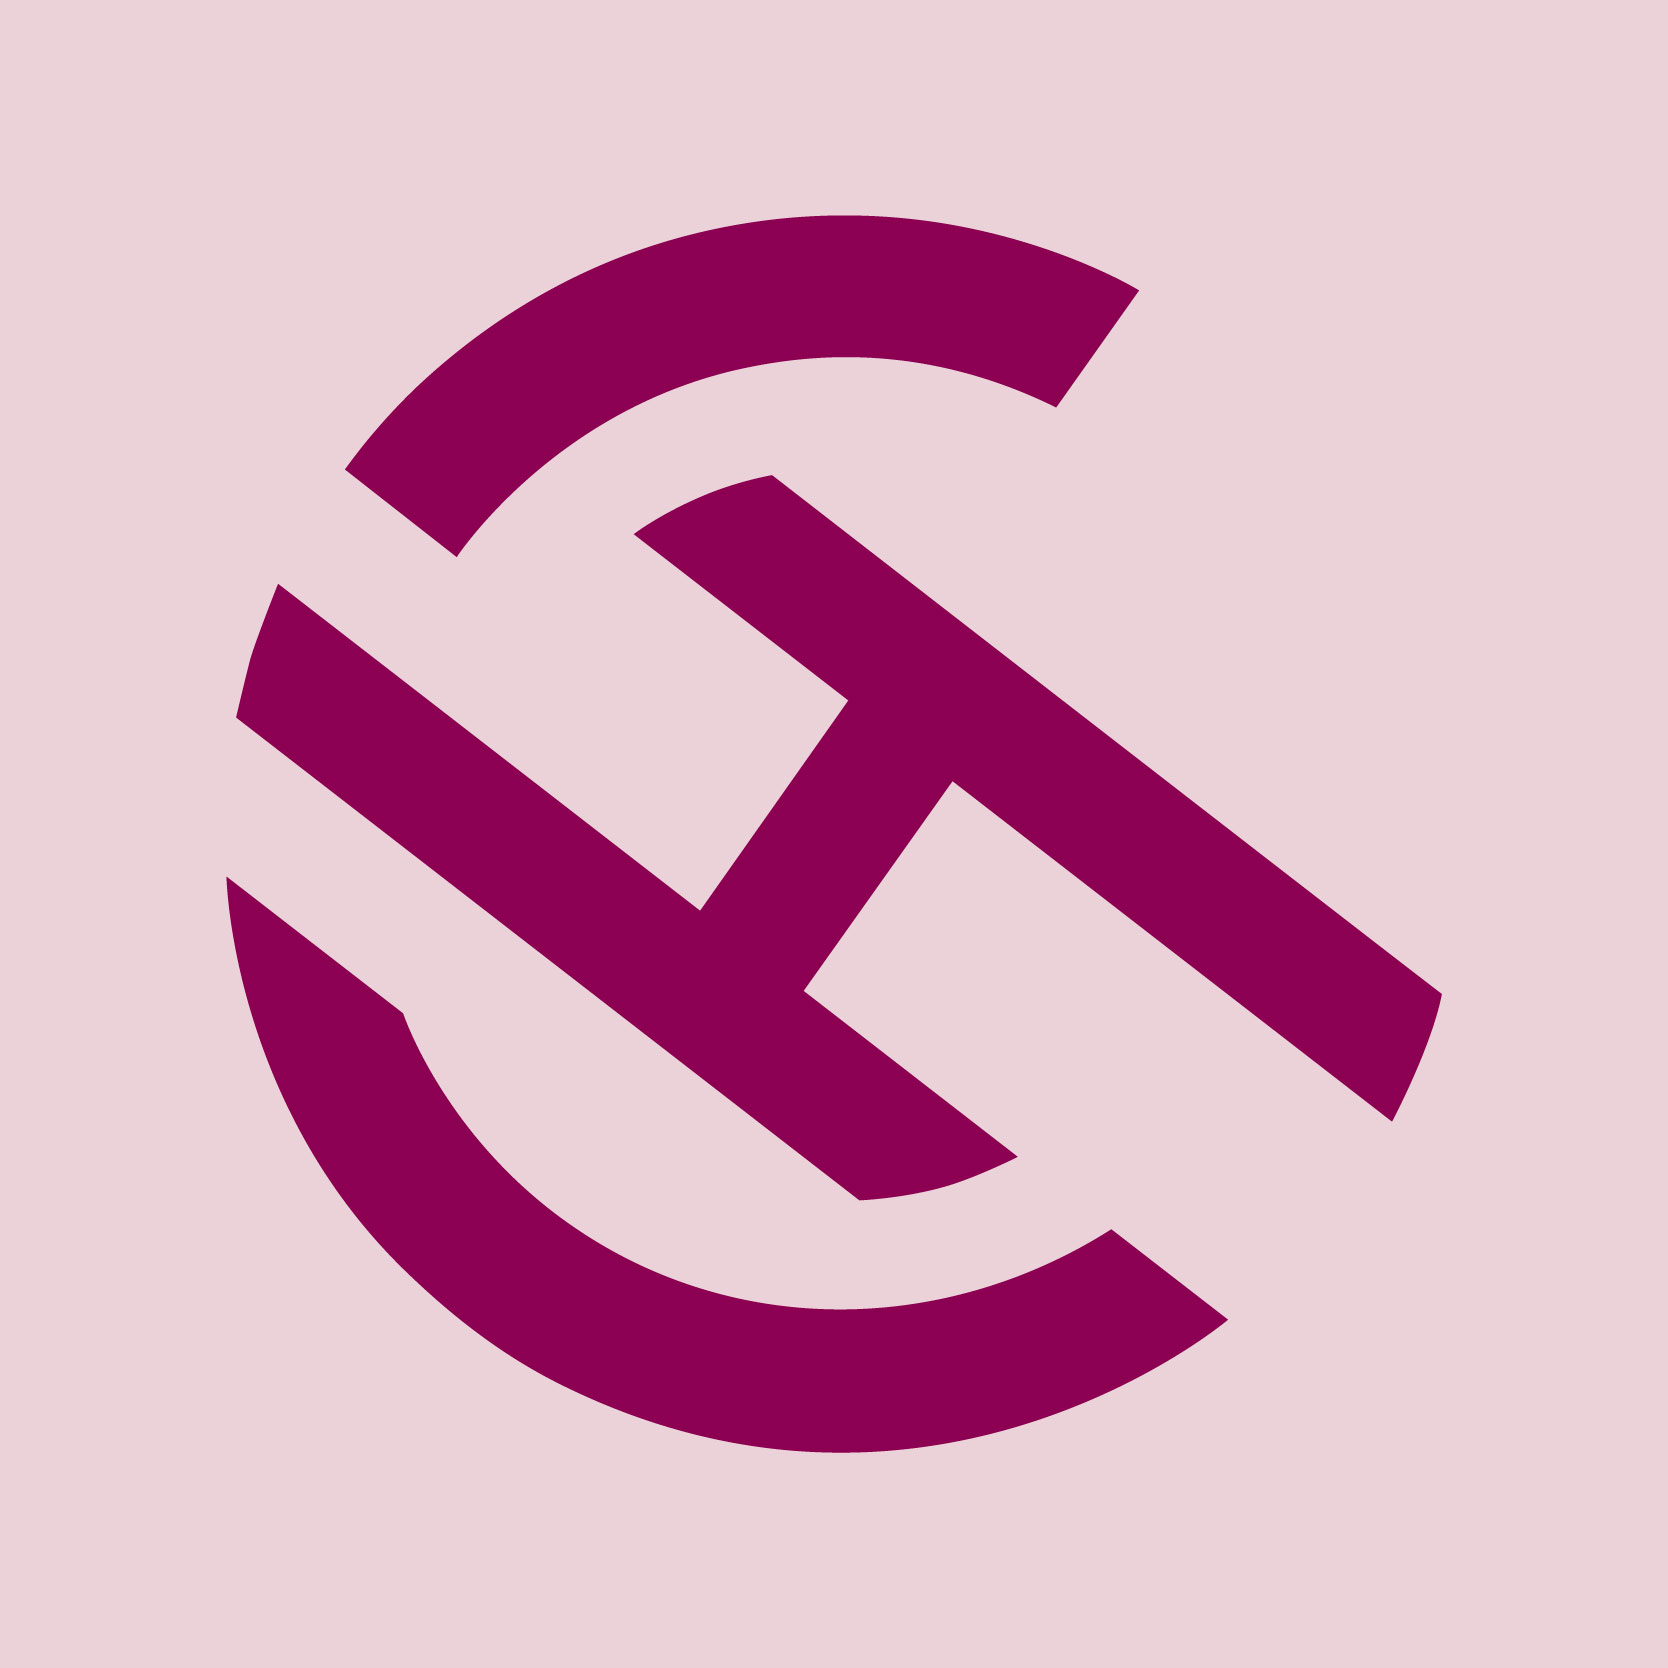 CandiceHabeychelogo. A burgundy C with a diagonal H inside.